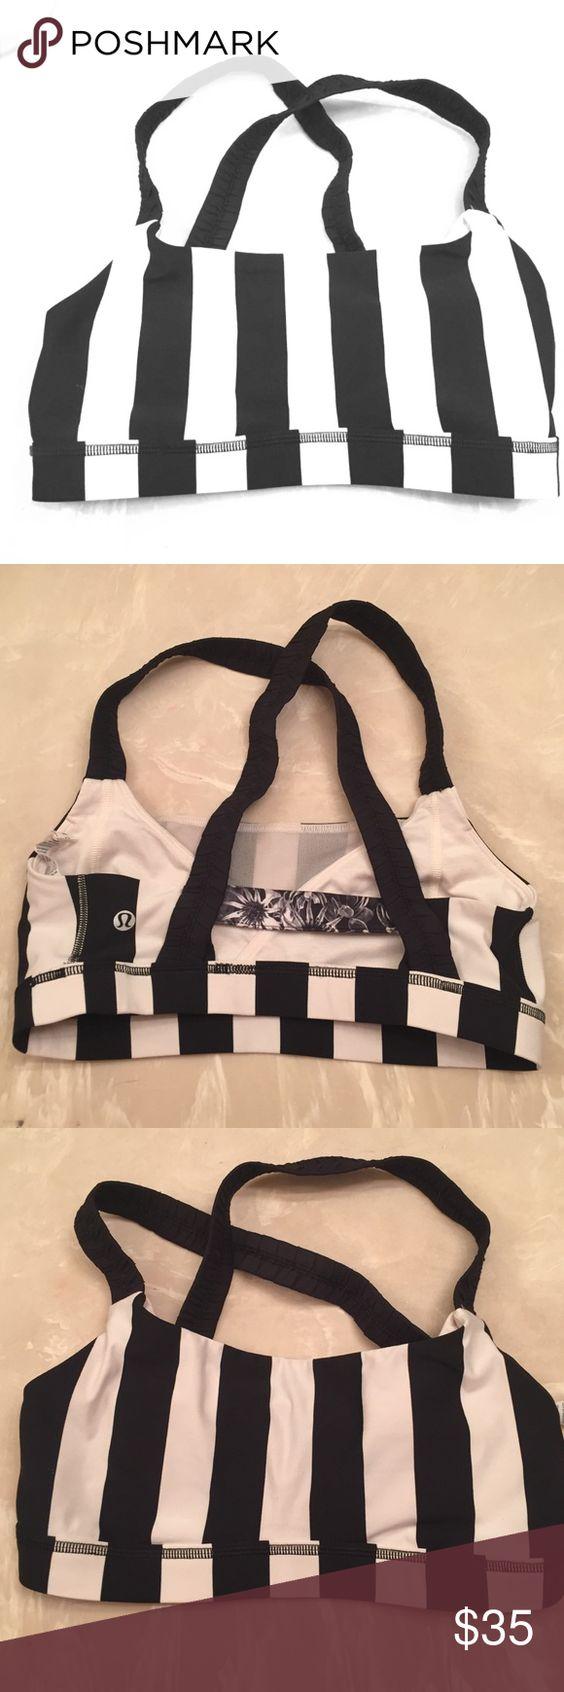 Lululemon sports bra Black and white striped sports bra size 8 lululemon athletica Other